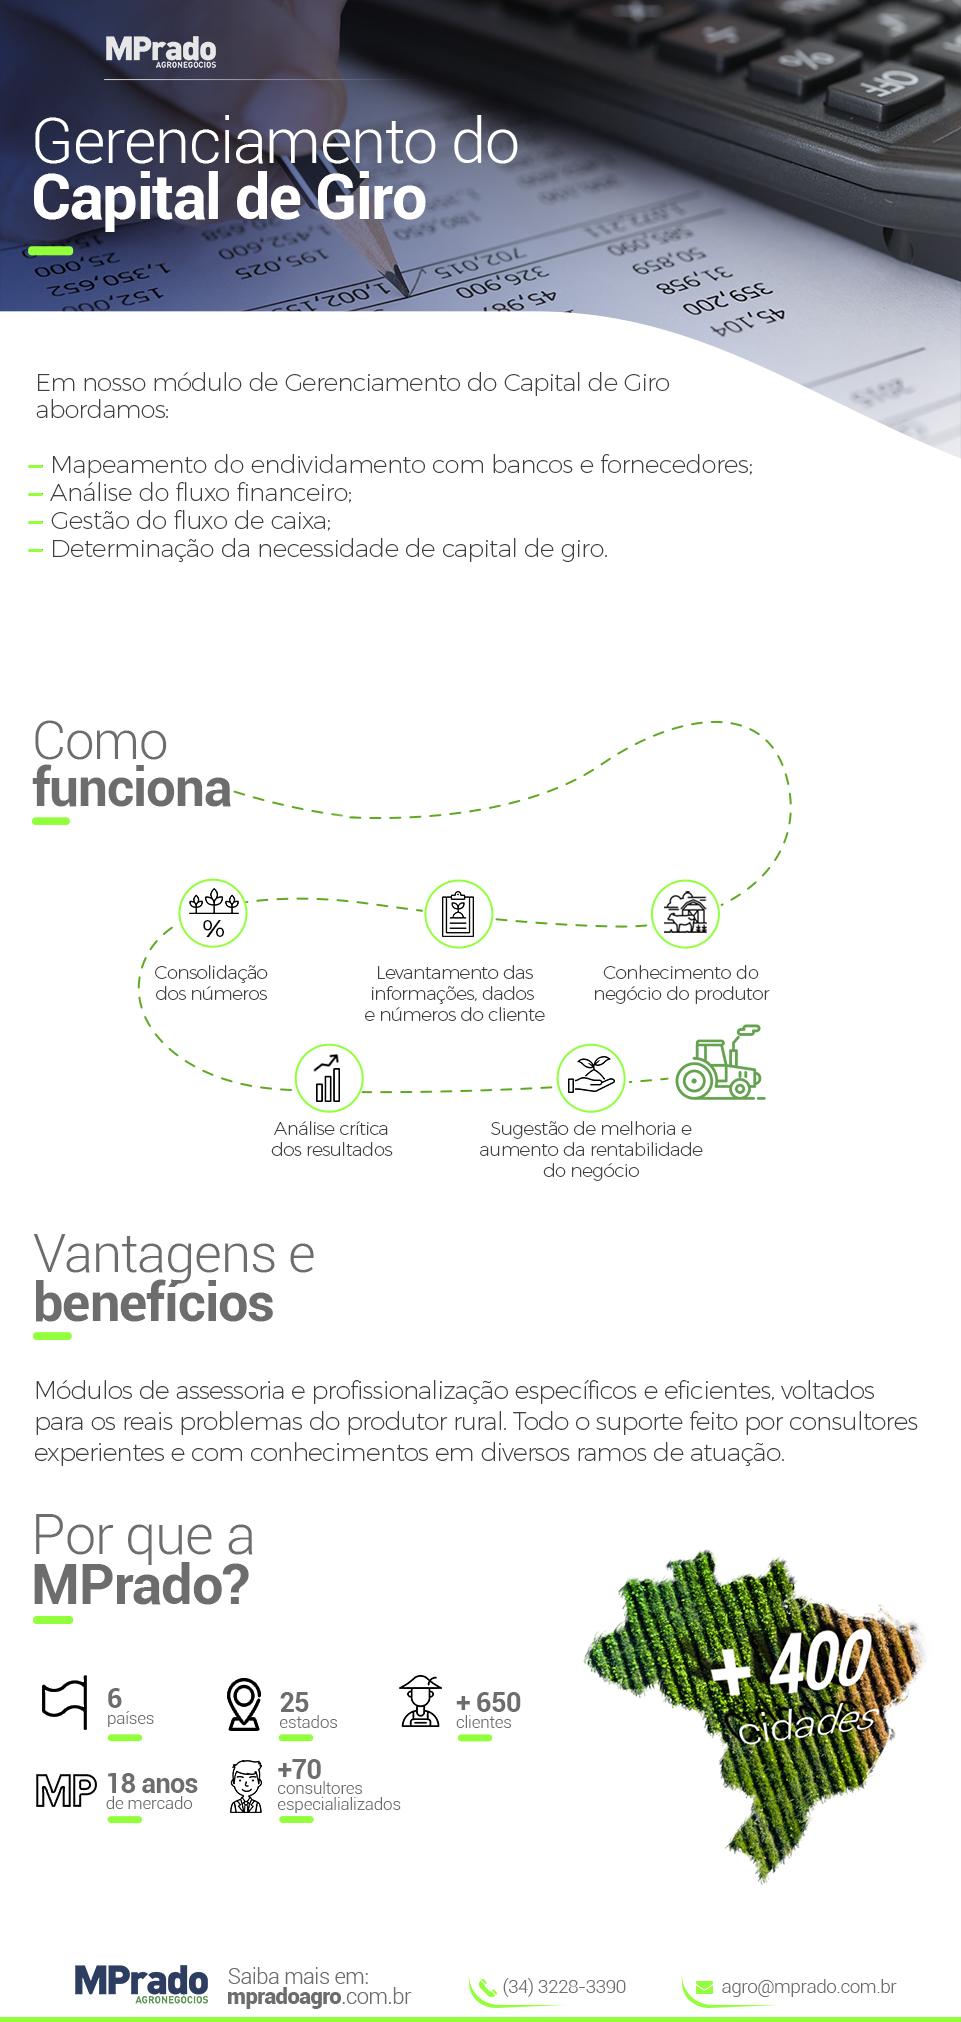 02 - Gerenciamento de capital